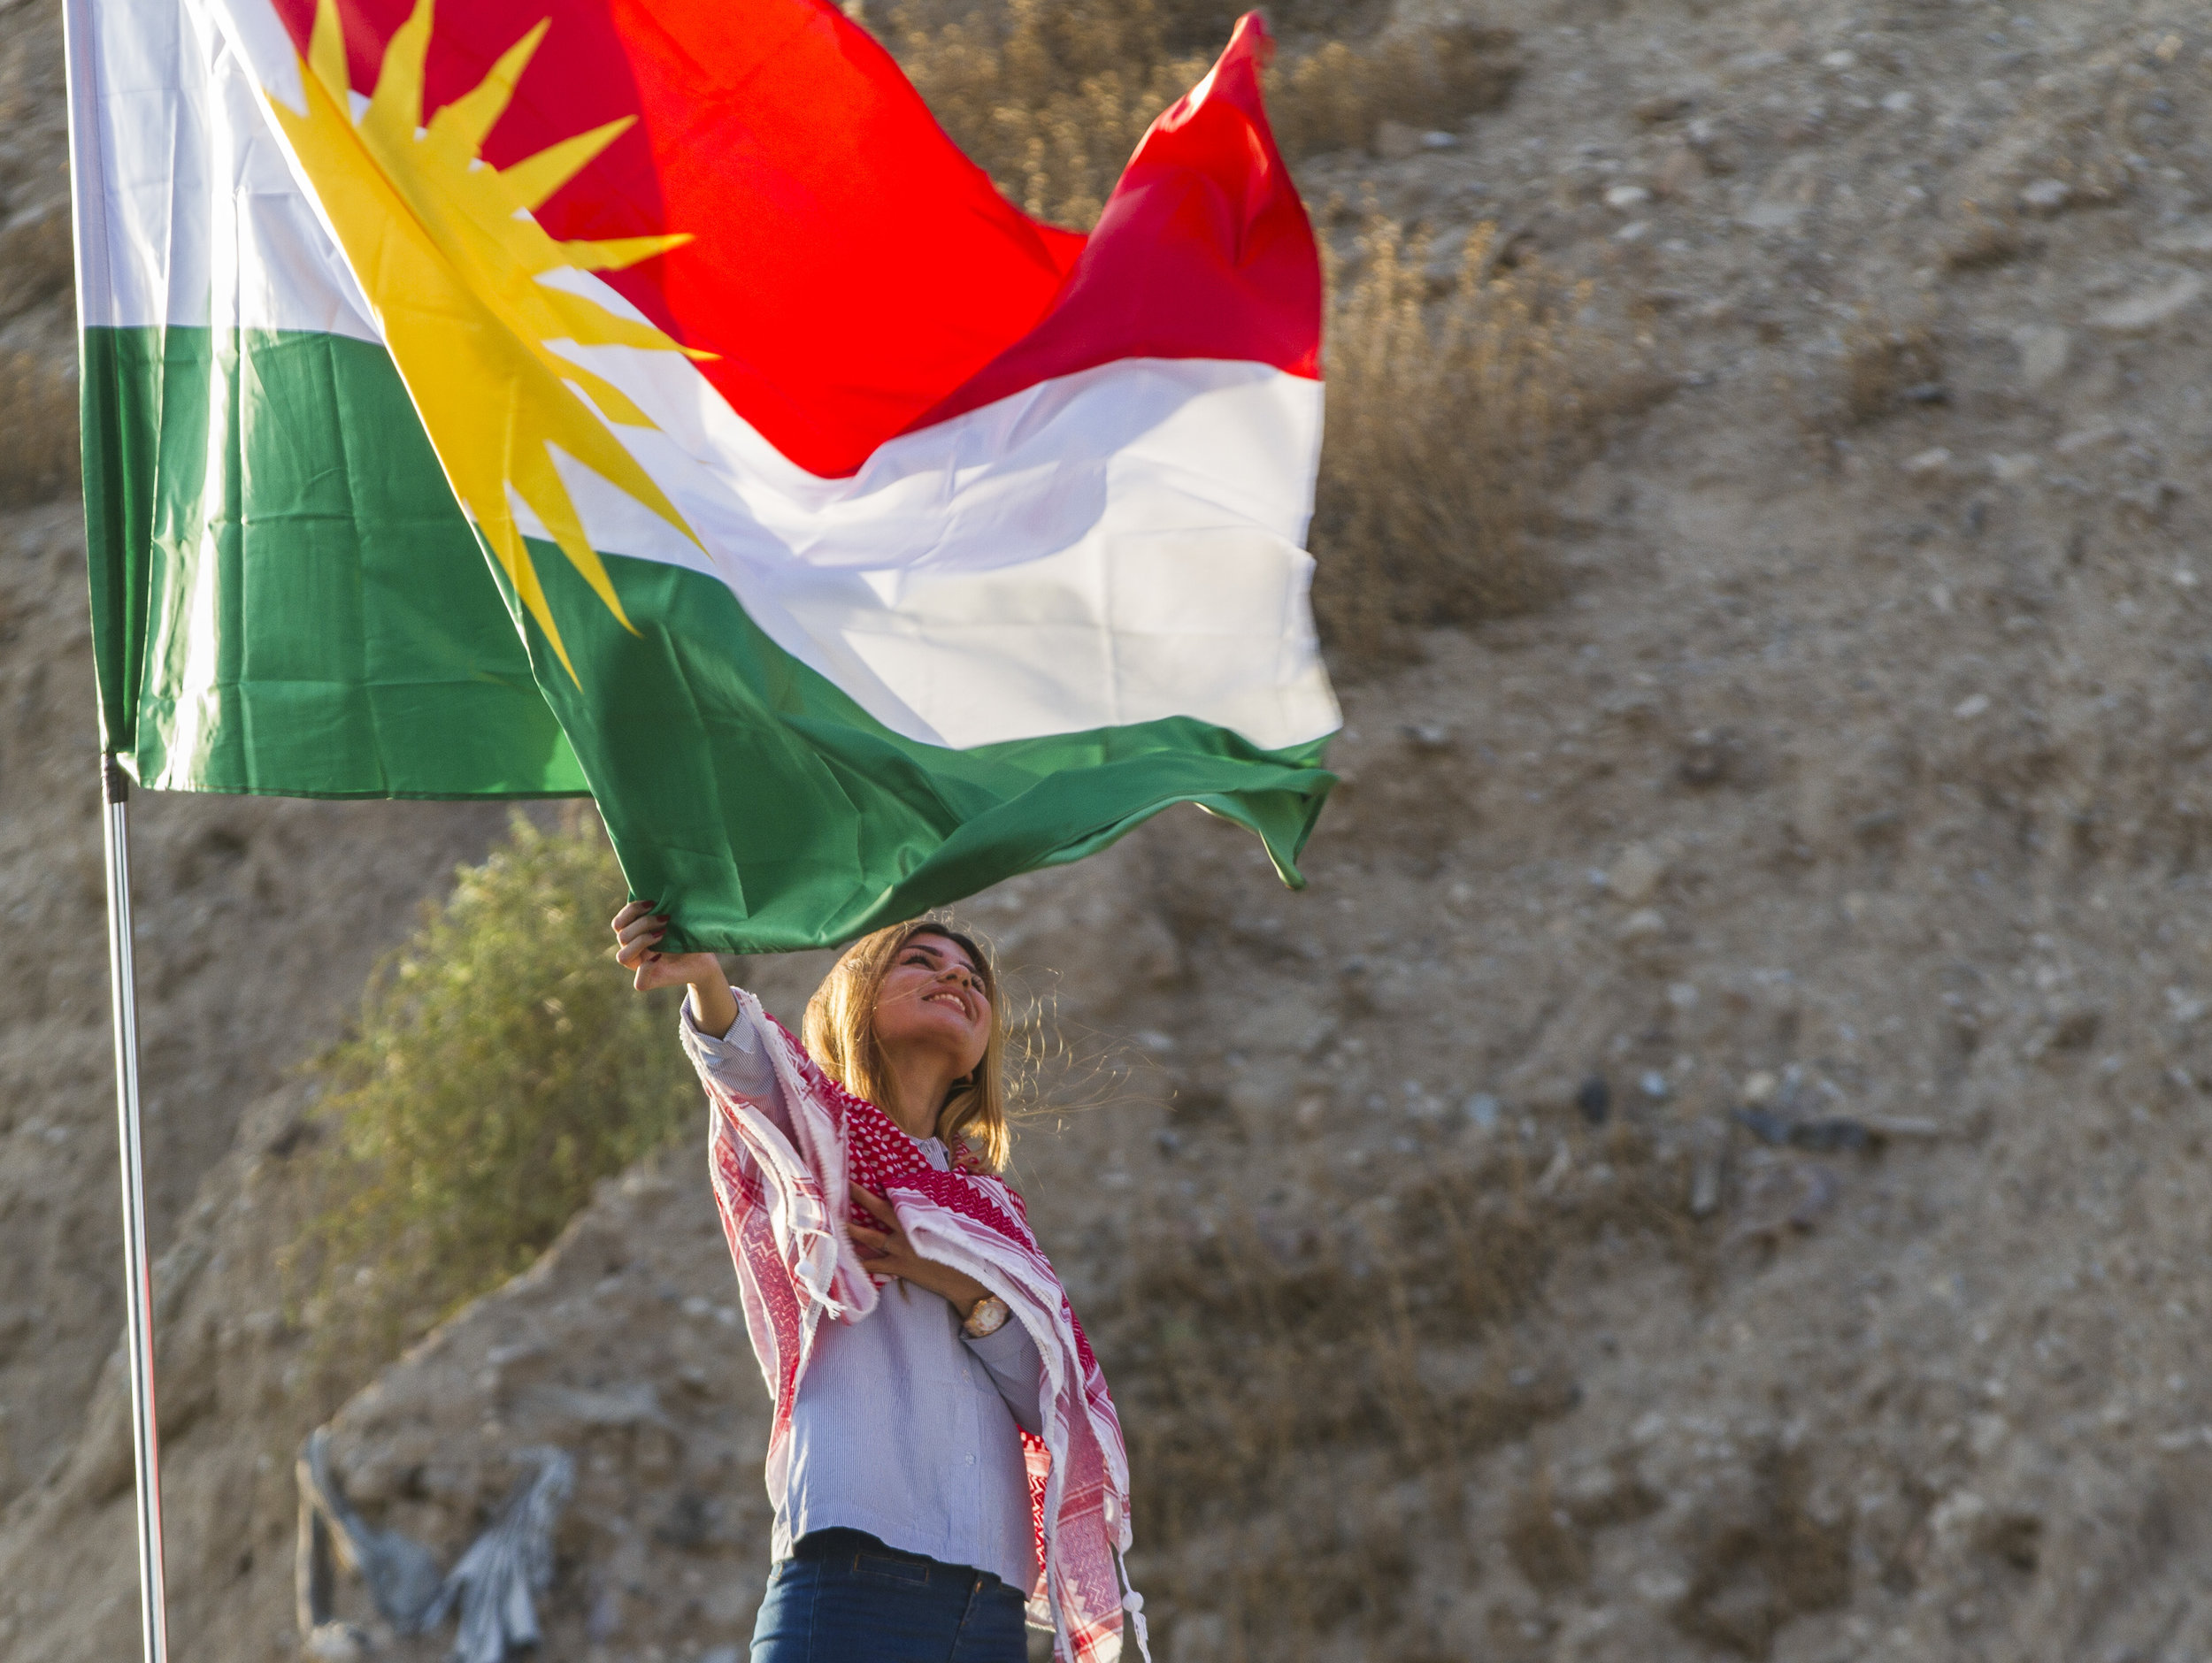 A woman poses next to the Iraqi Kurdistan flag in Eribl.